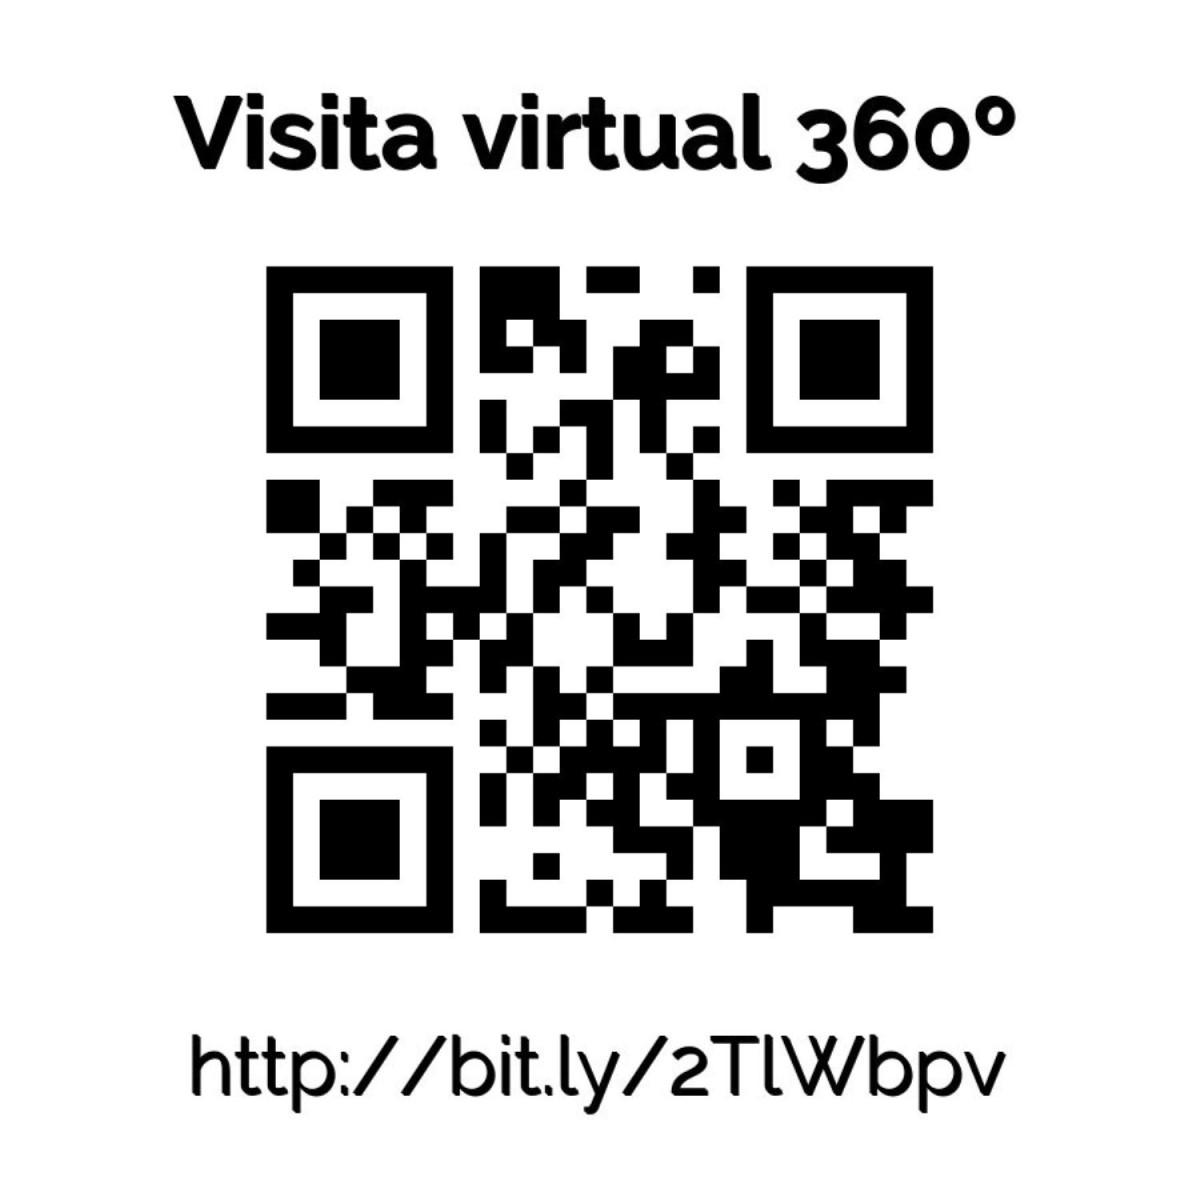 3408-03957